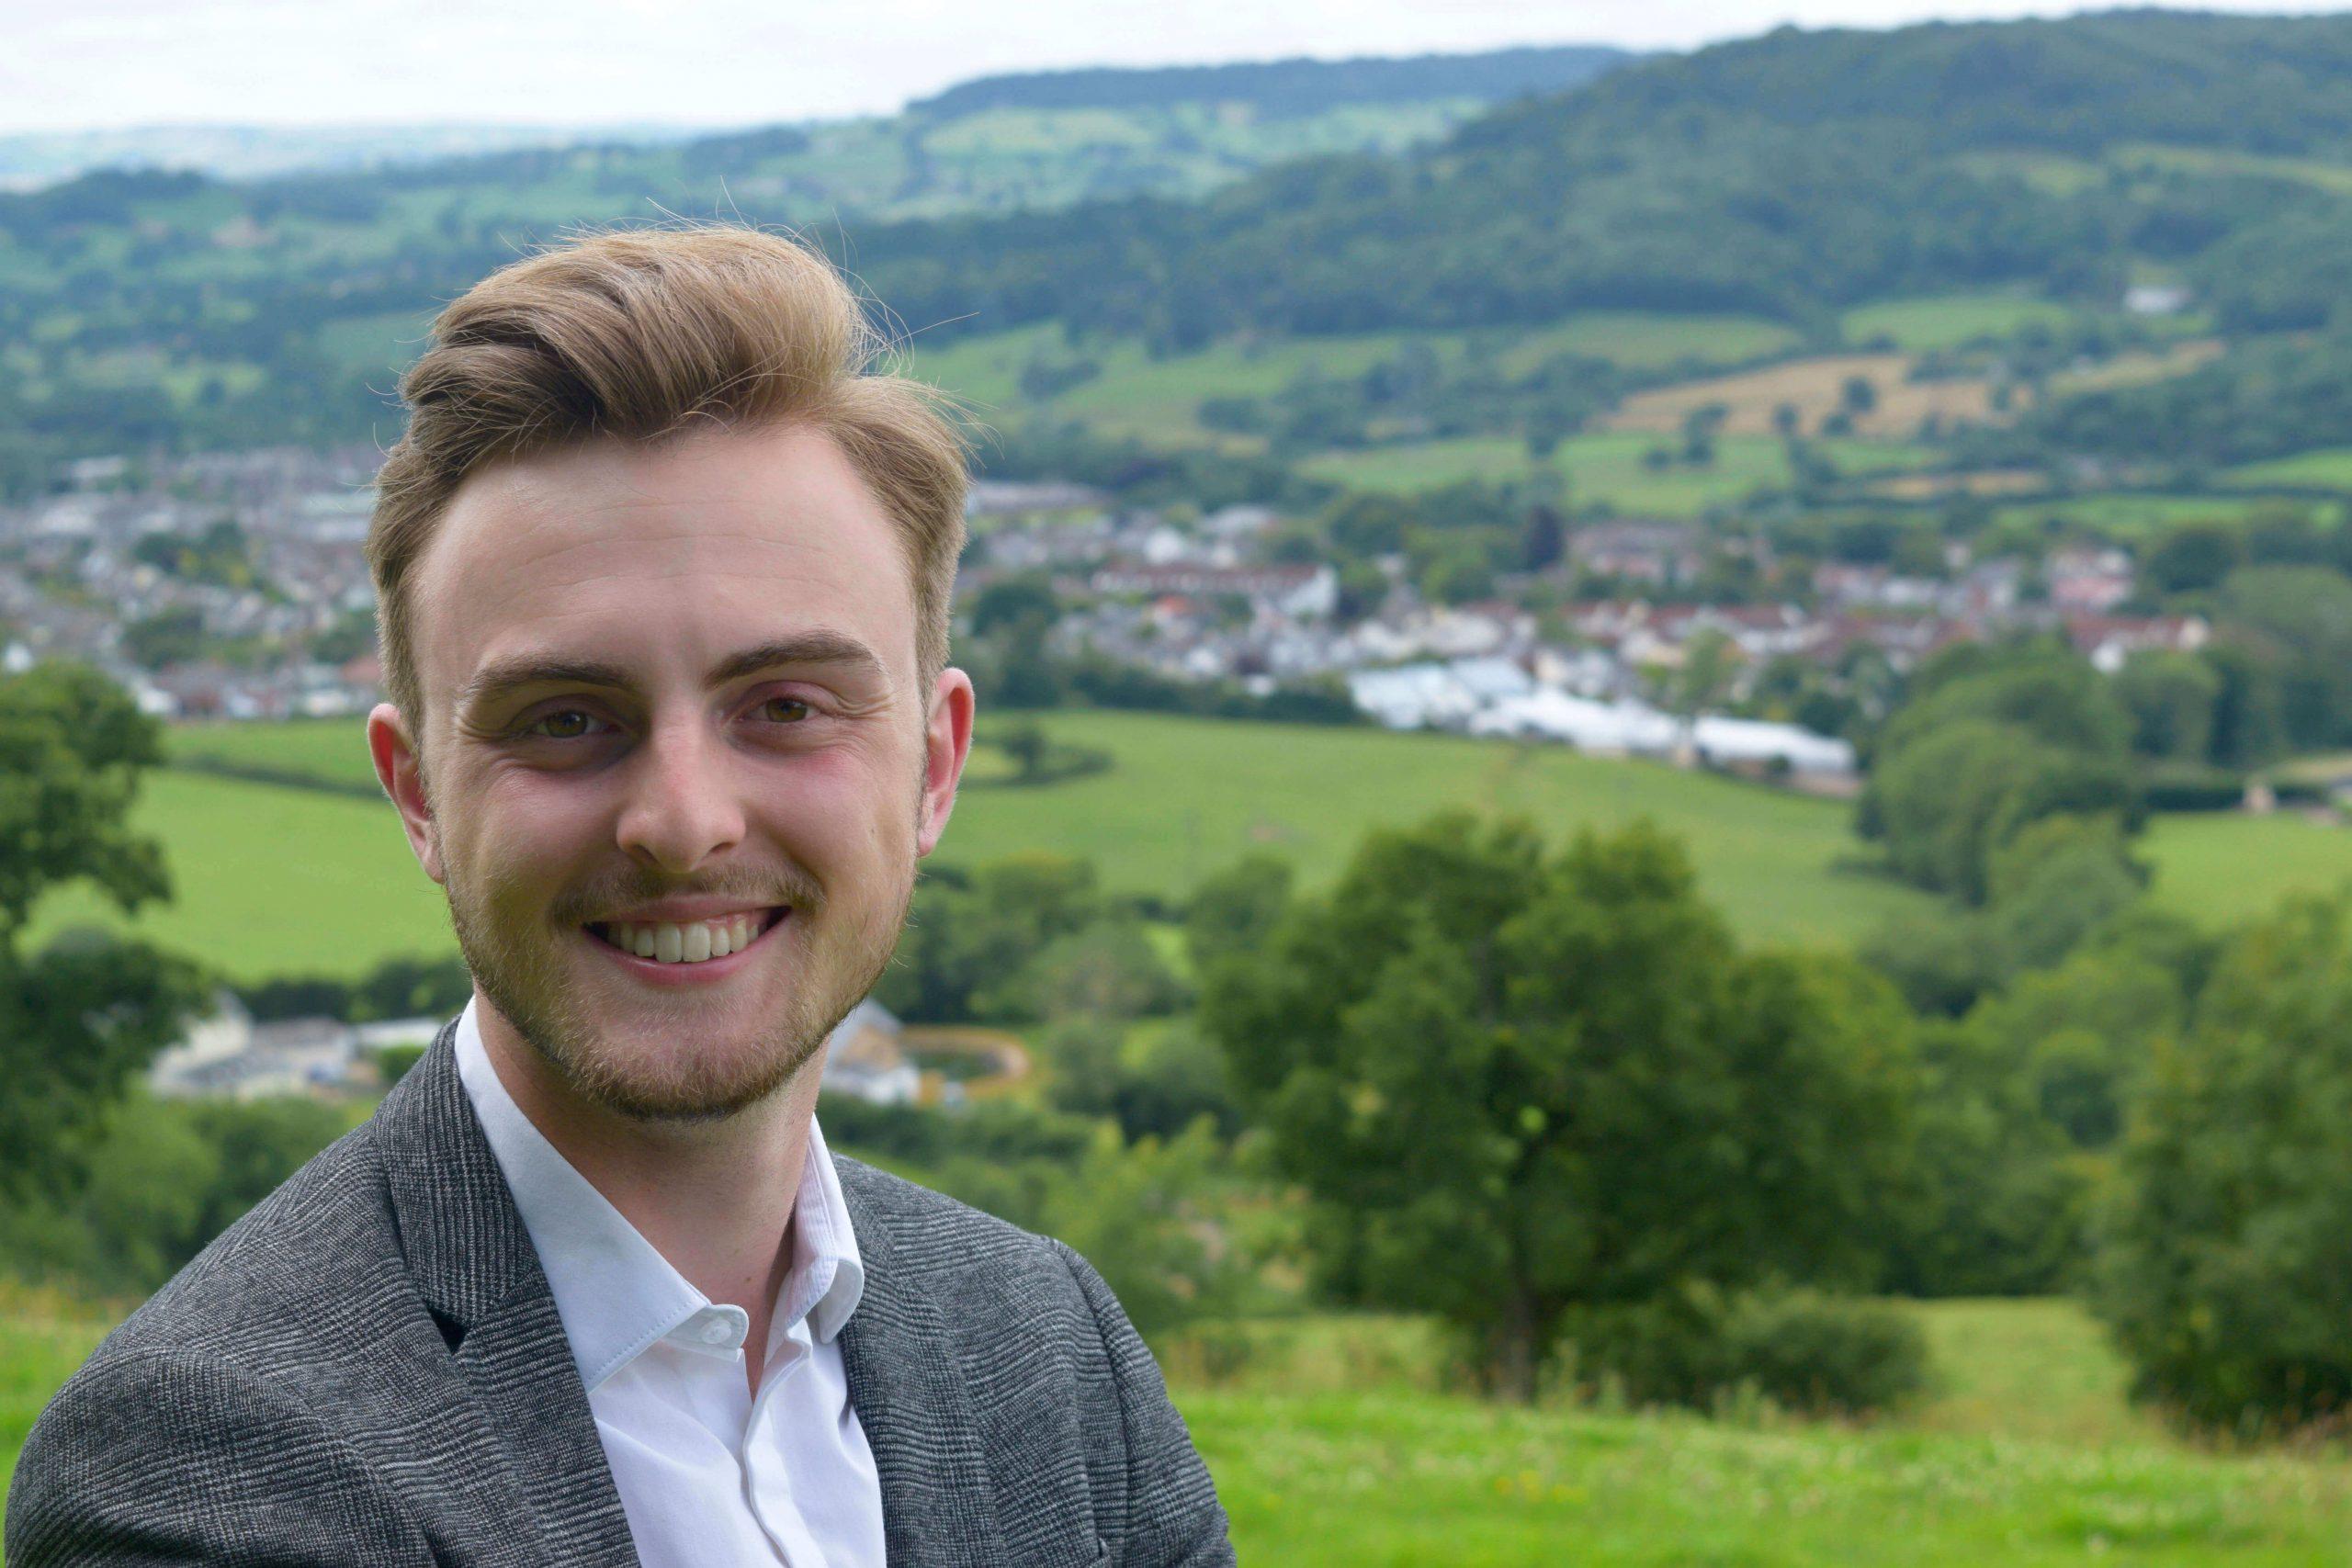 East Devon Jake Bonetta, aged 19, won in the Honiton St Michael's ward. Image: Jake Bonetta